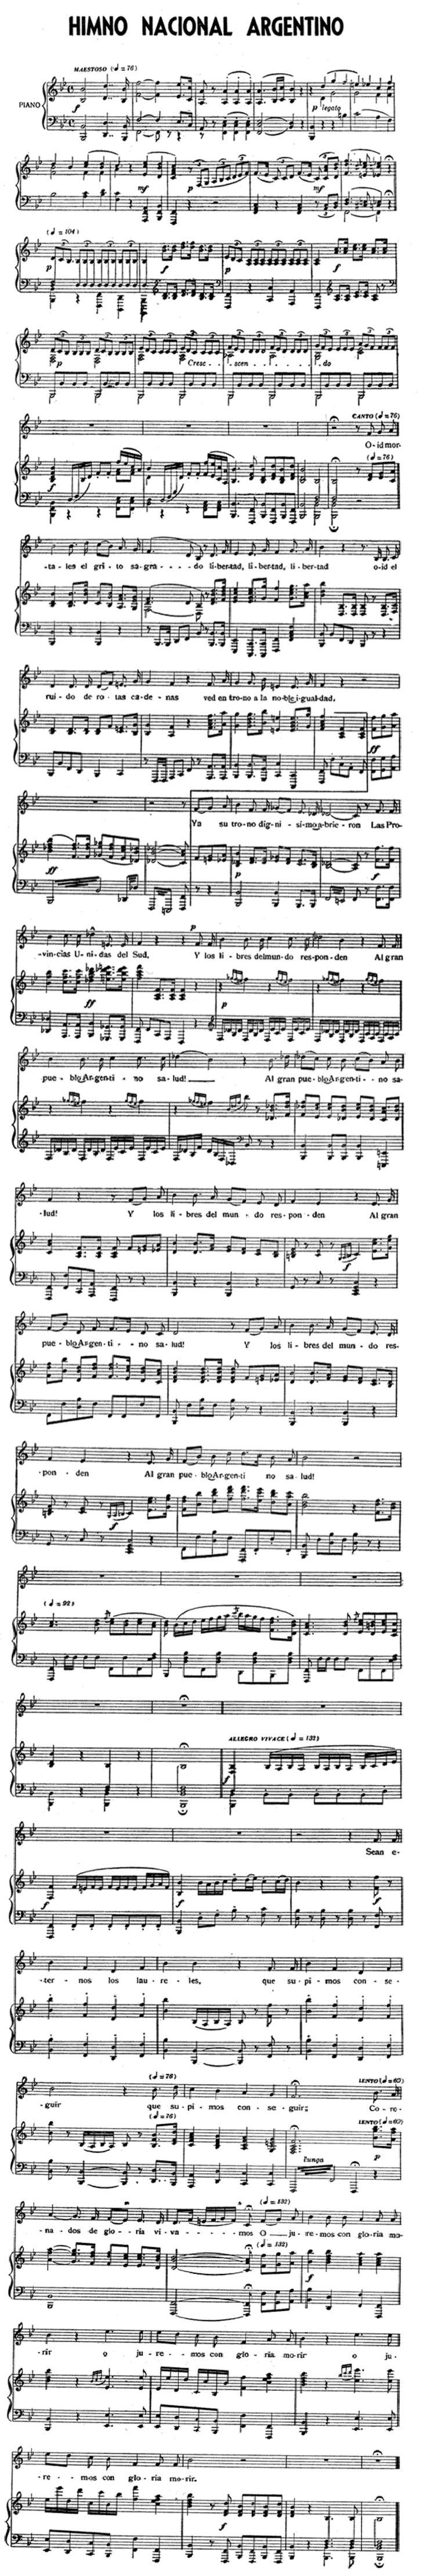 Partitura del Himno Nacional Argentino / Sheet Music of the Argentine National Anthem